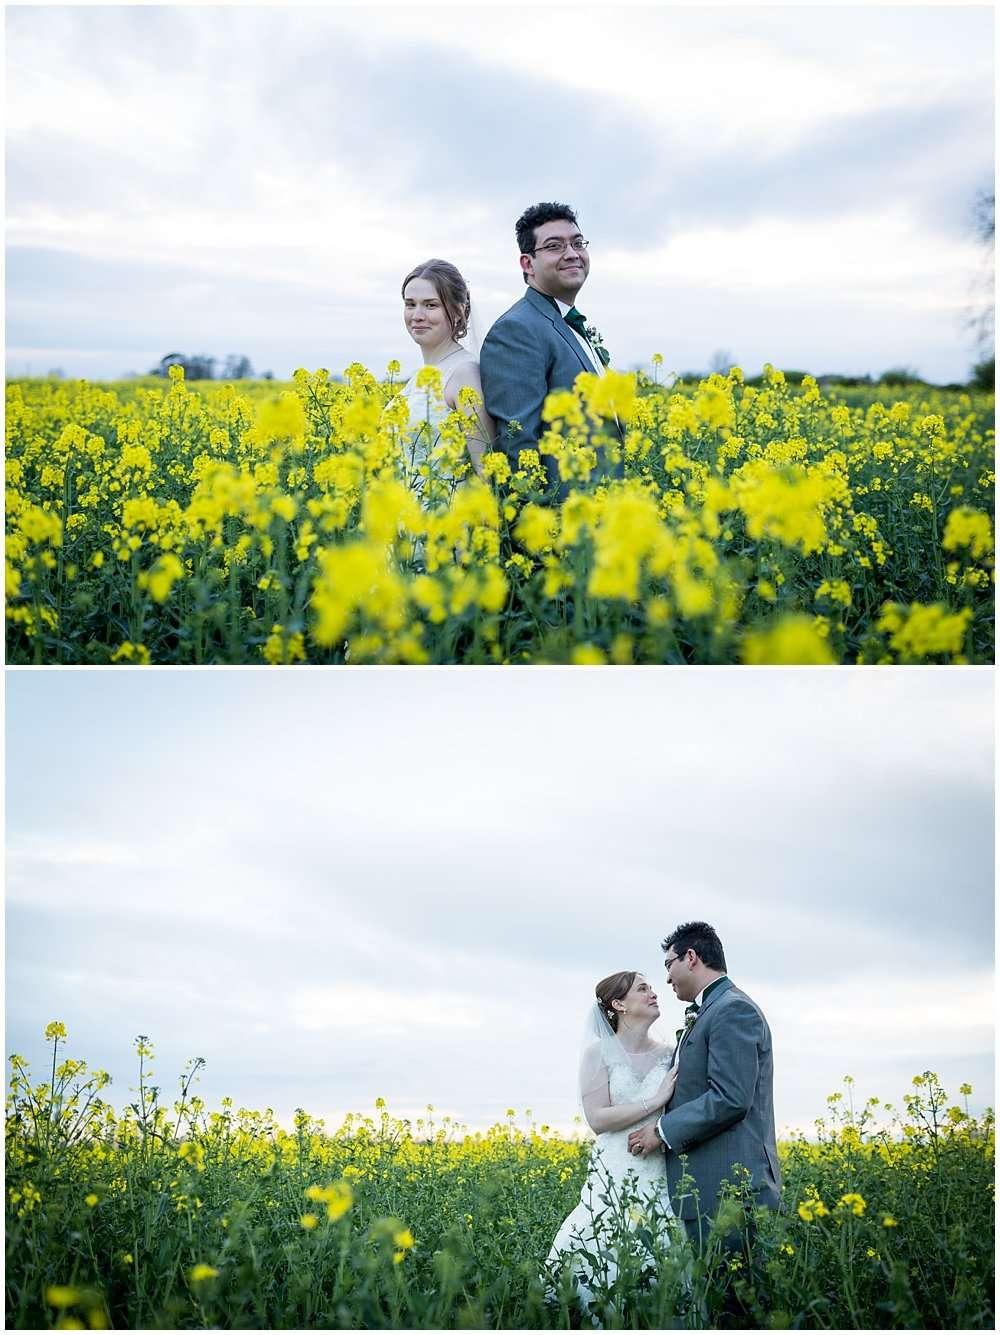 CHLOE AND JAIMIN RED BARN WEDDING - NORFOLK WEDDING PHOTOGRAPHER 2